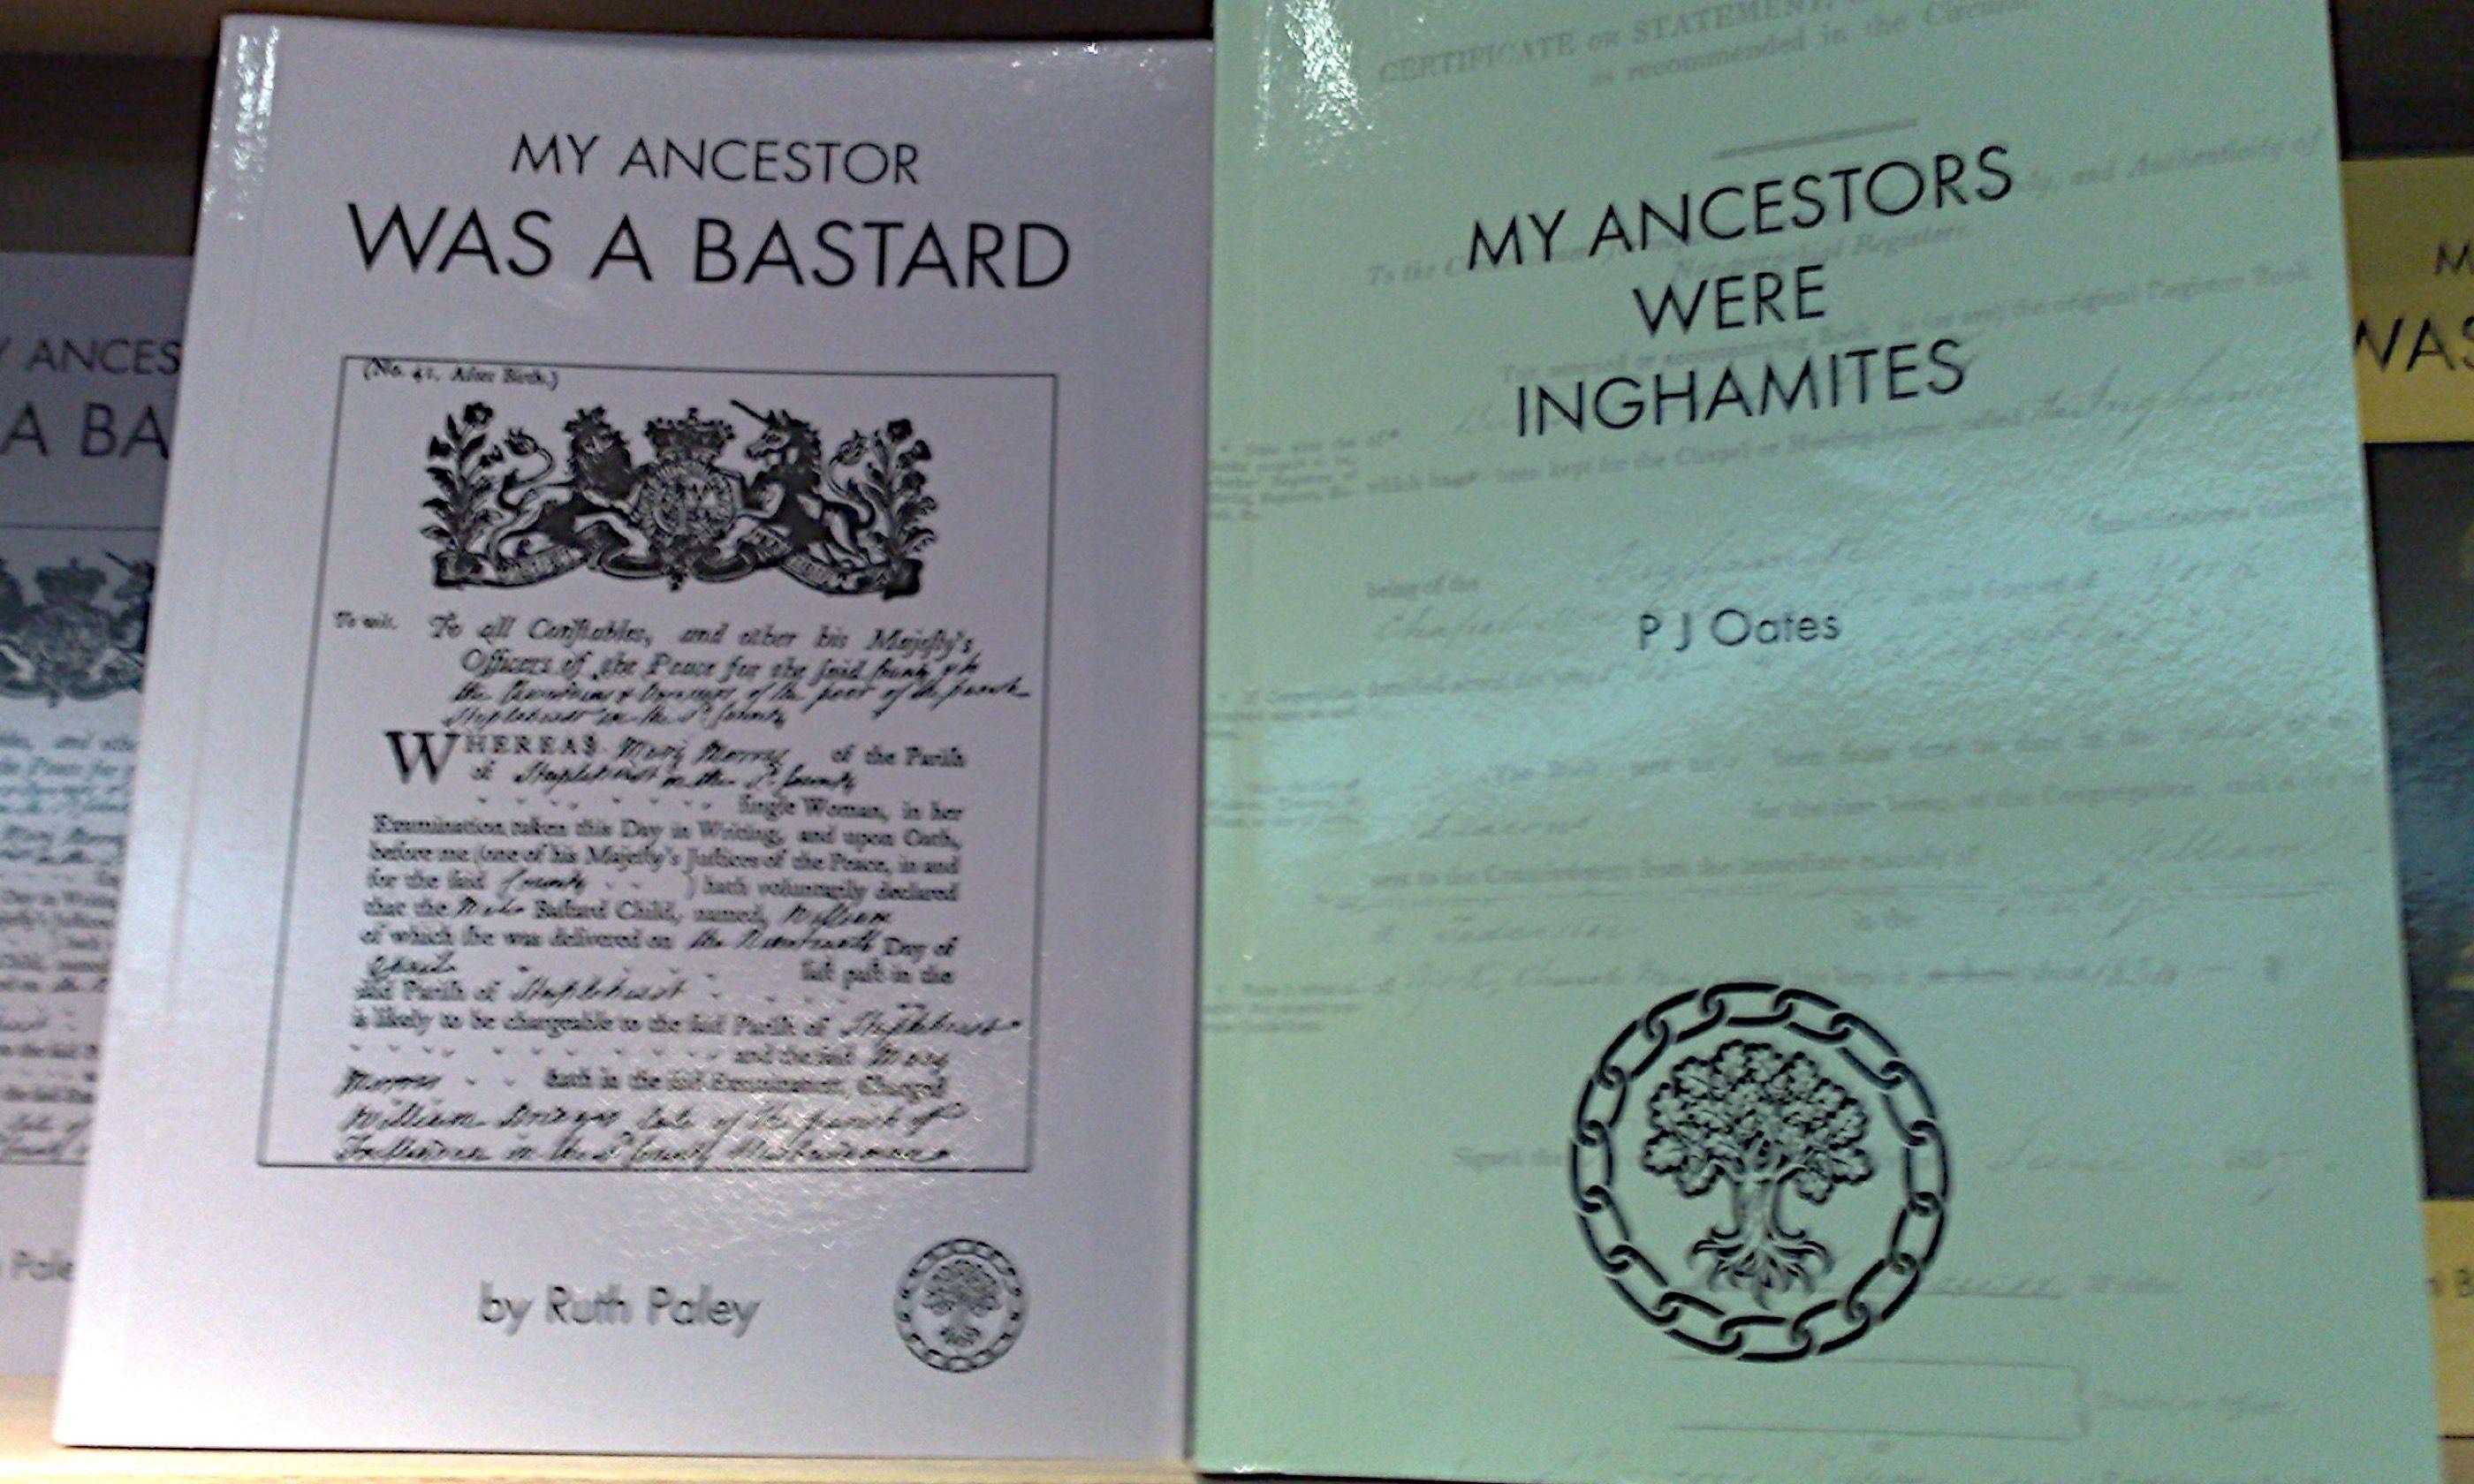 My Ancestors were bastards (Peter Moore)